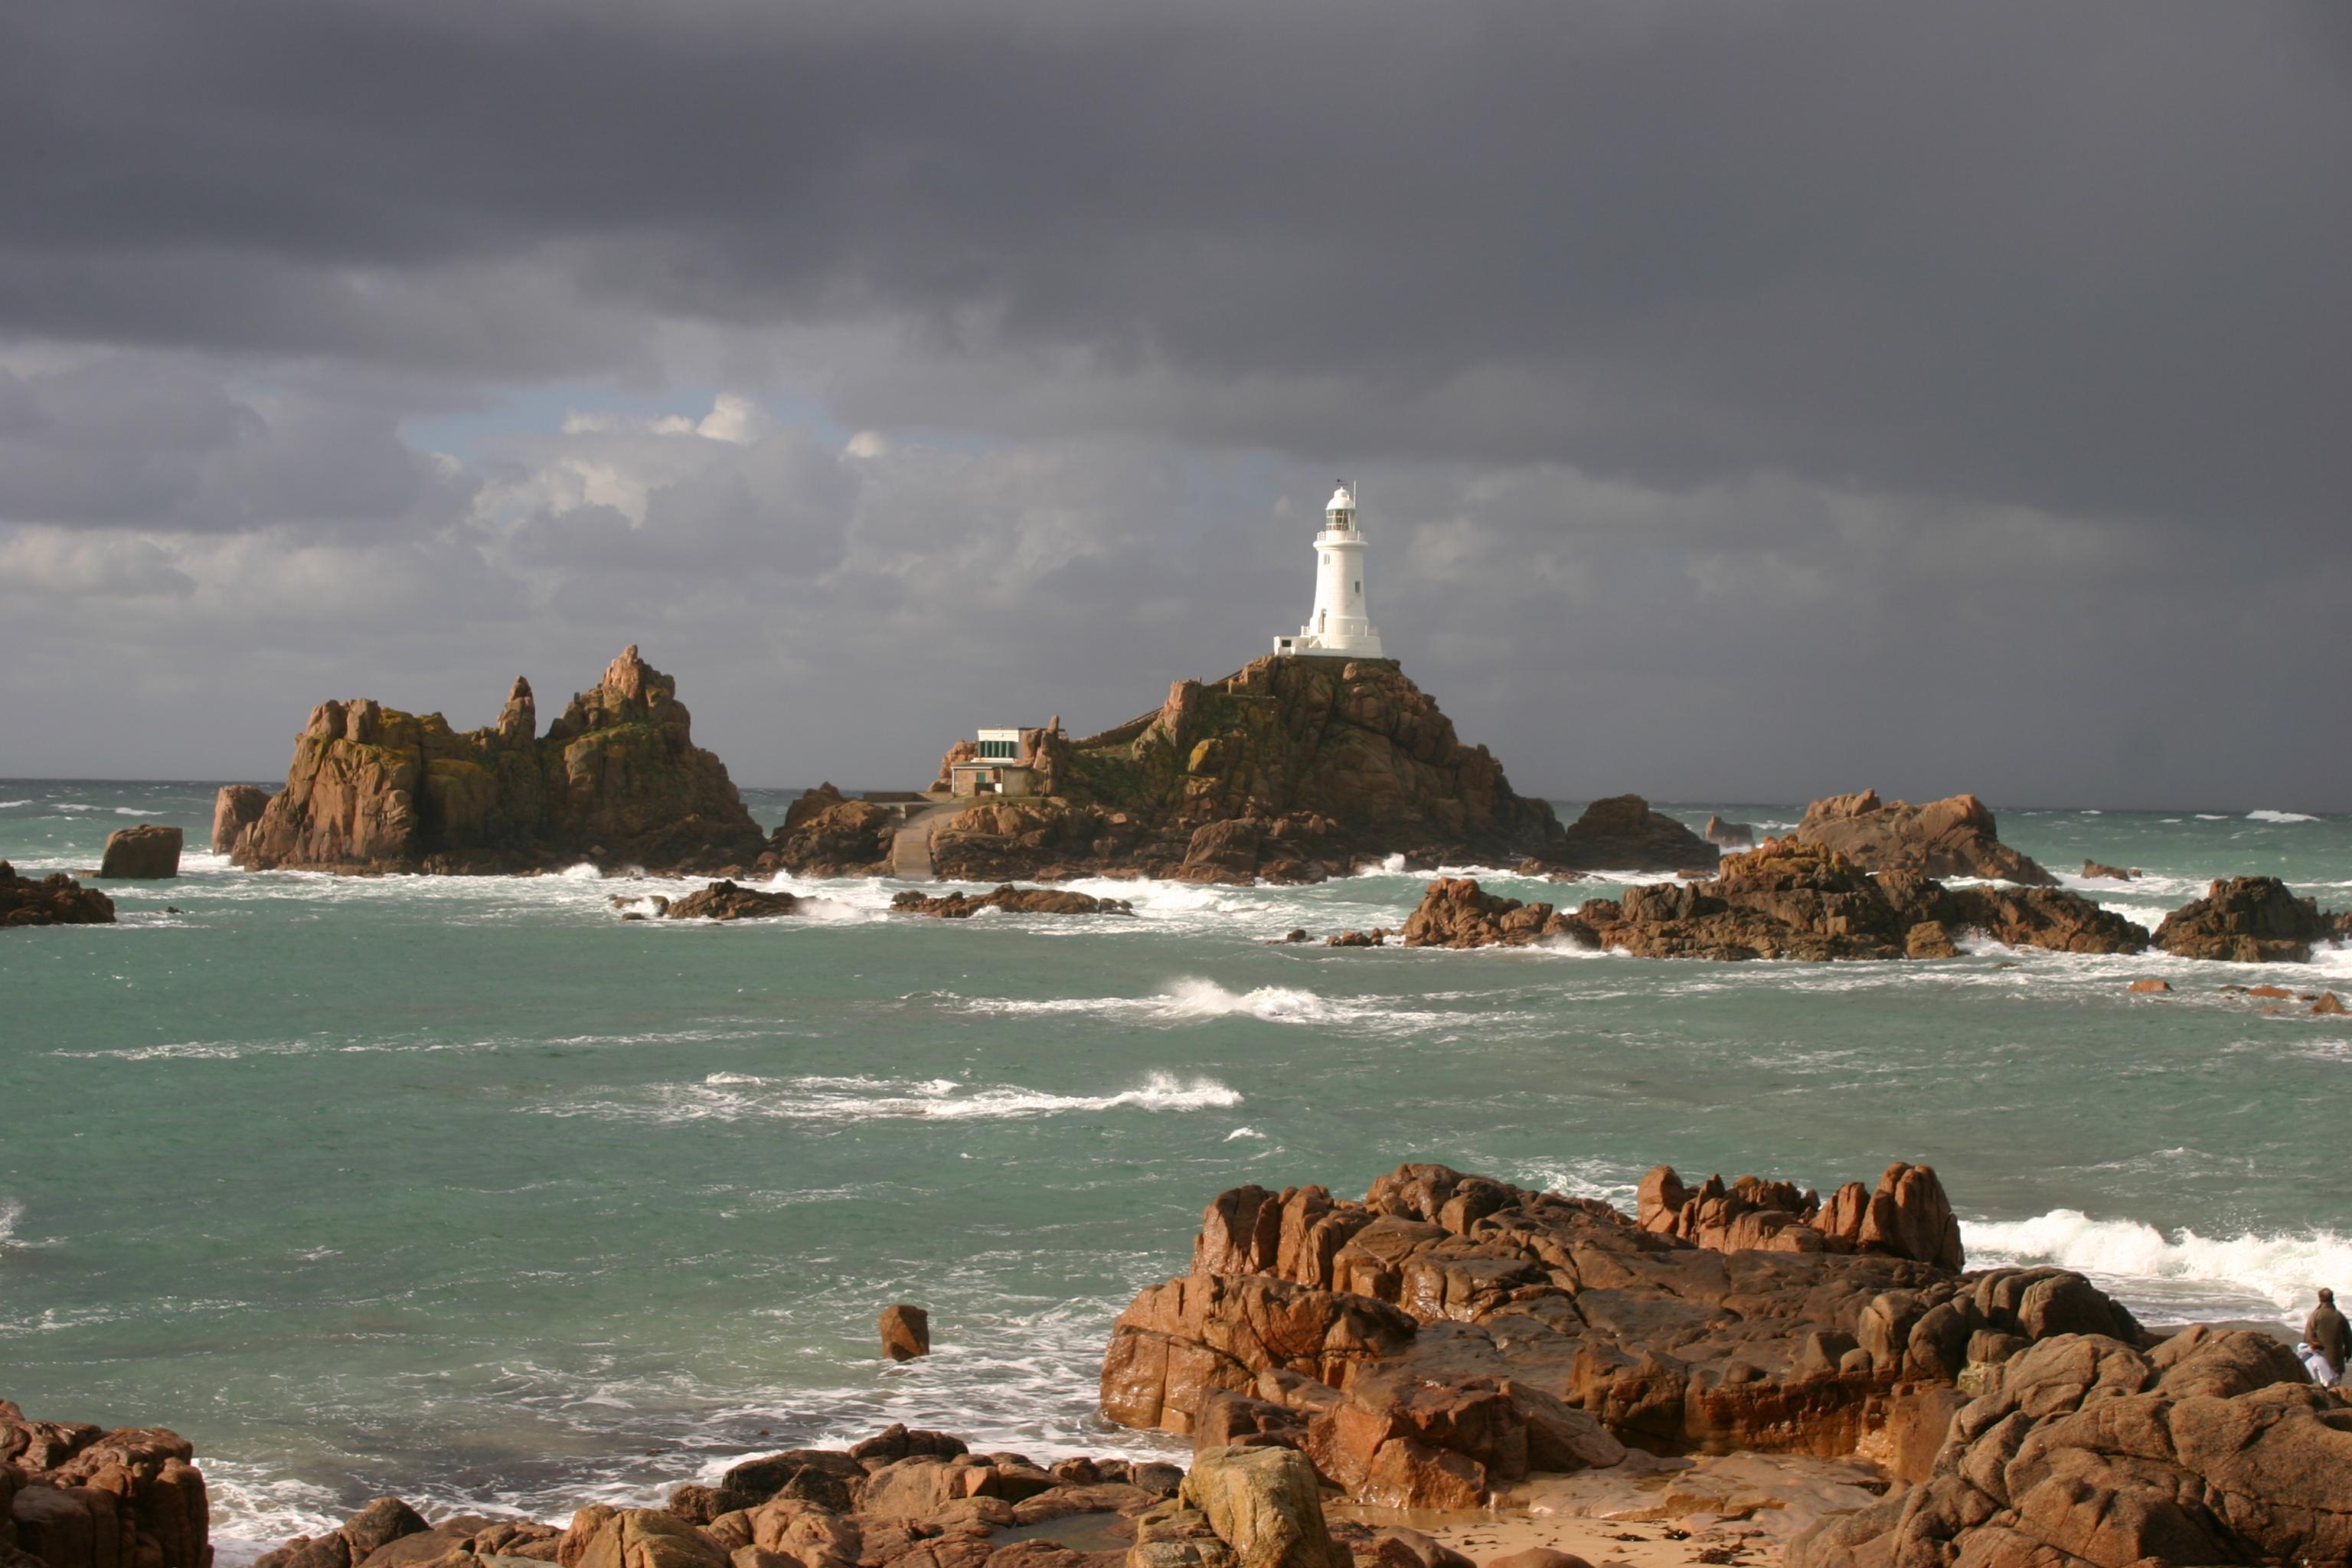 Corbiere - Der berühmteste Leuchtturm vor Jersey